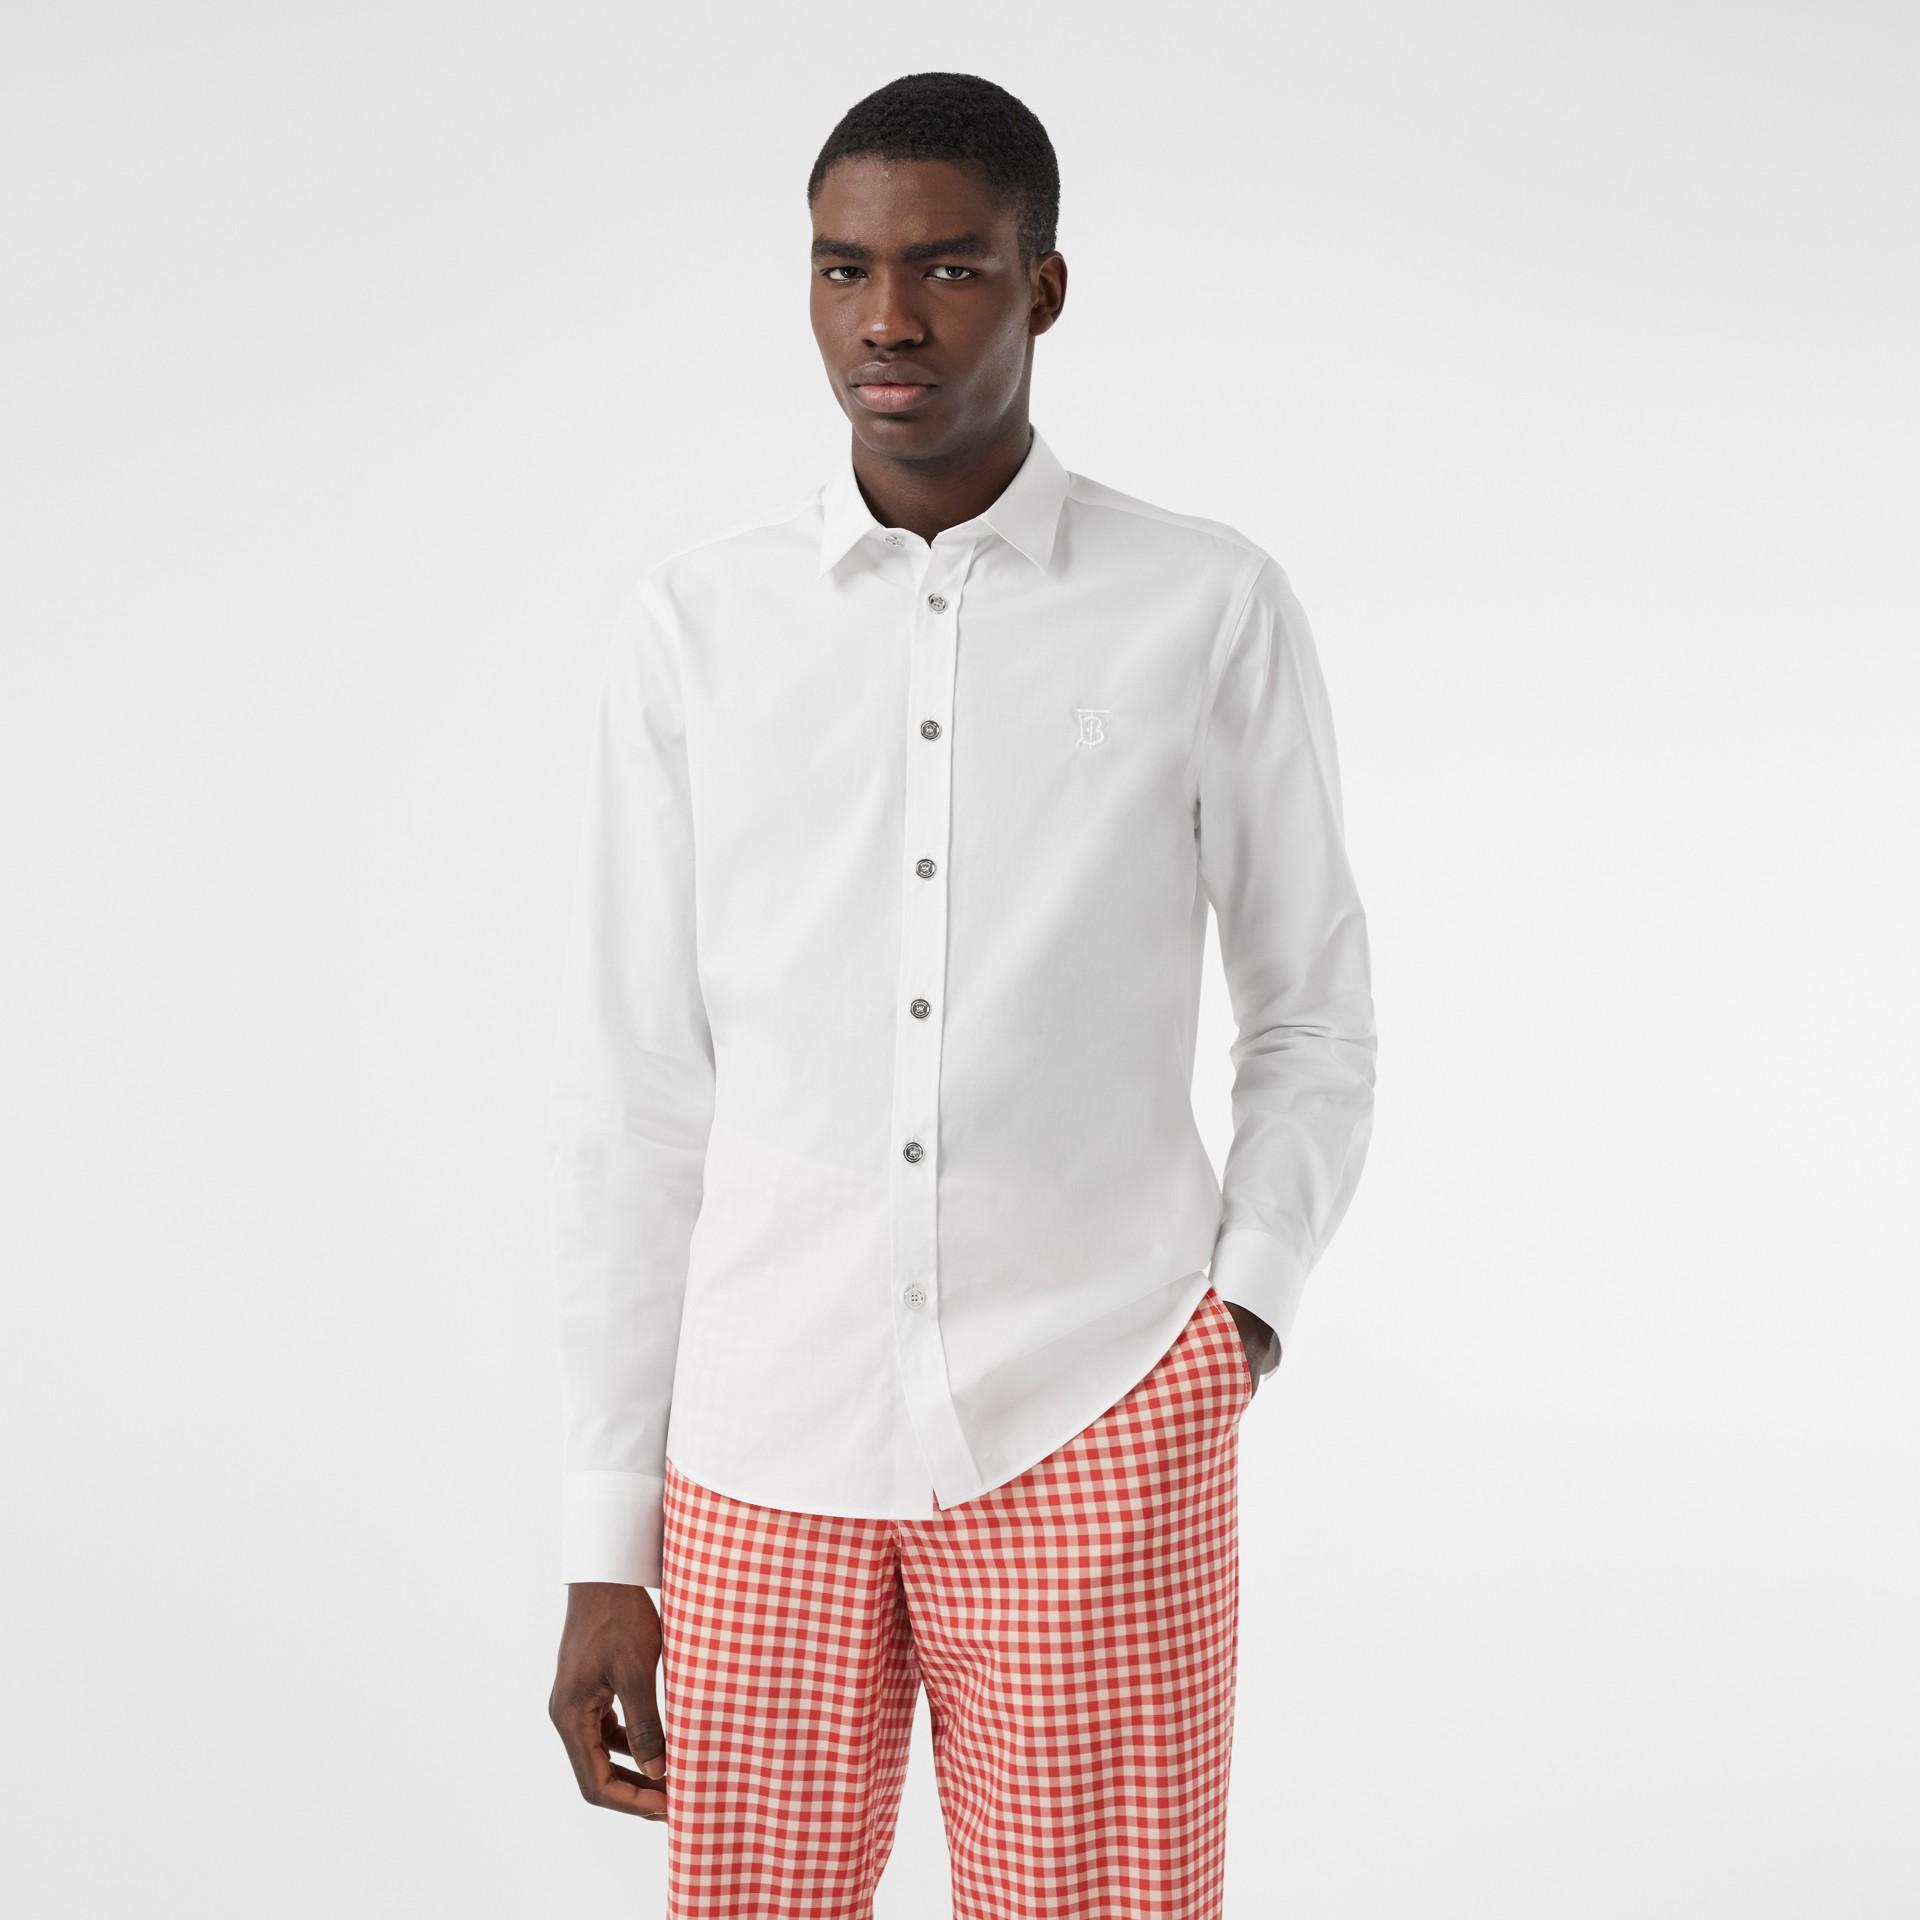 Monogram Motif Stretch Cotton Poplin Shirt in White - Men | Burberry - gallery image 0